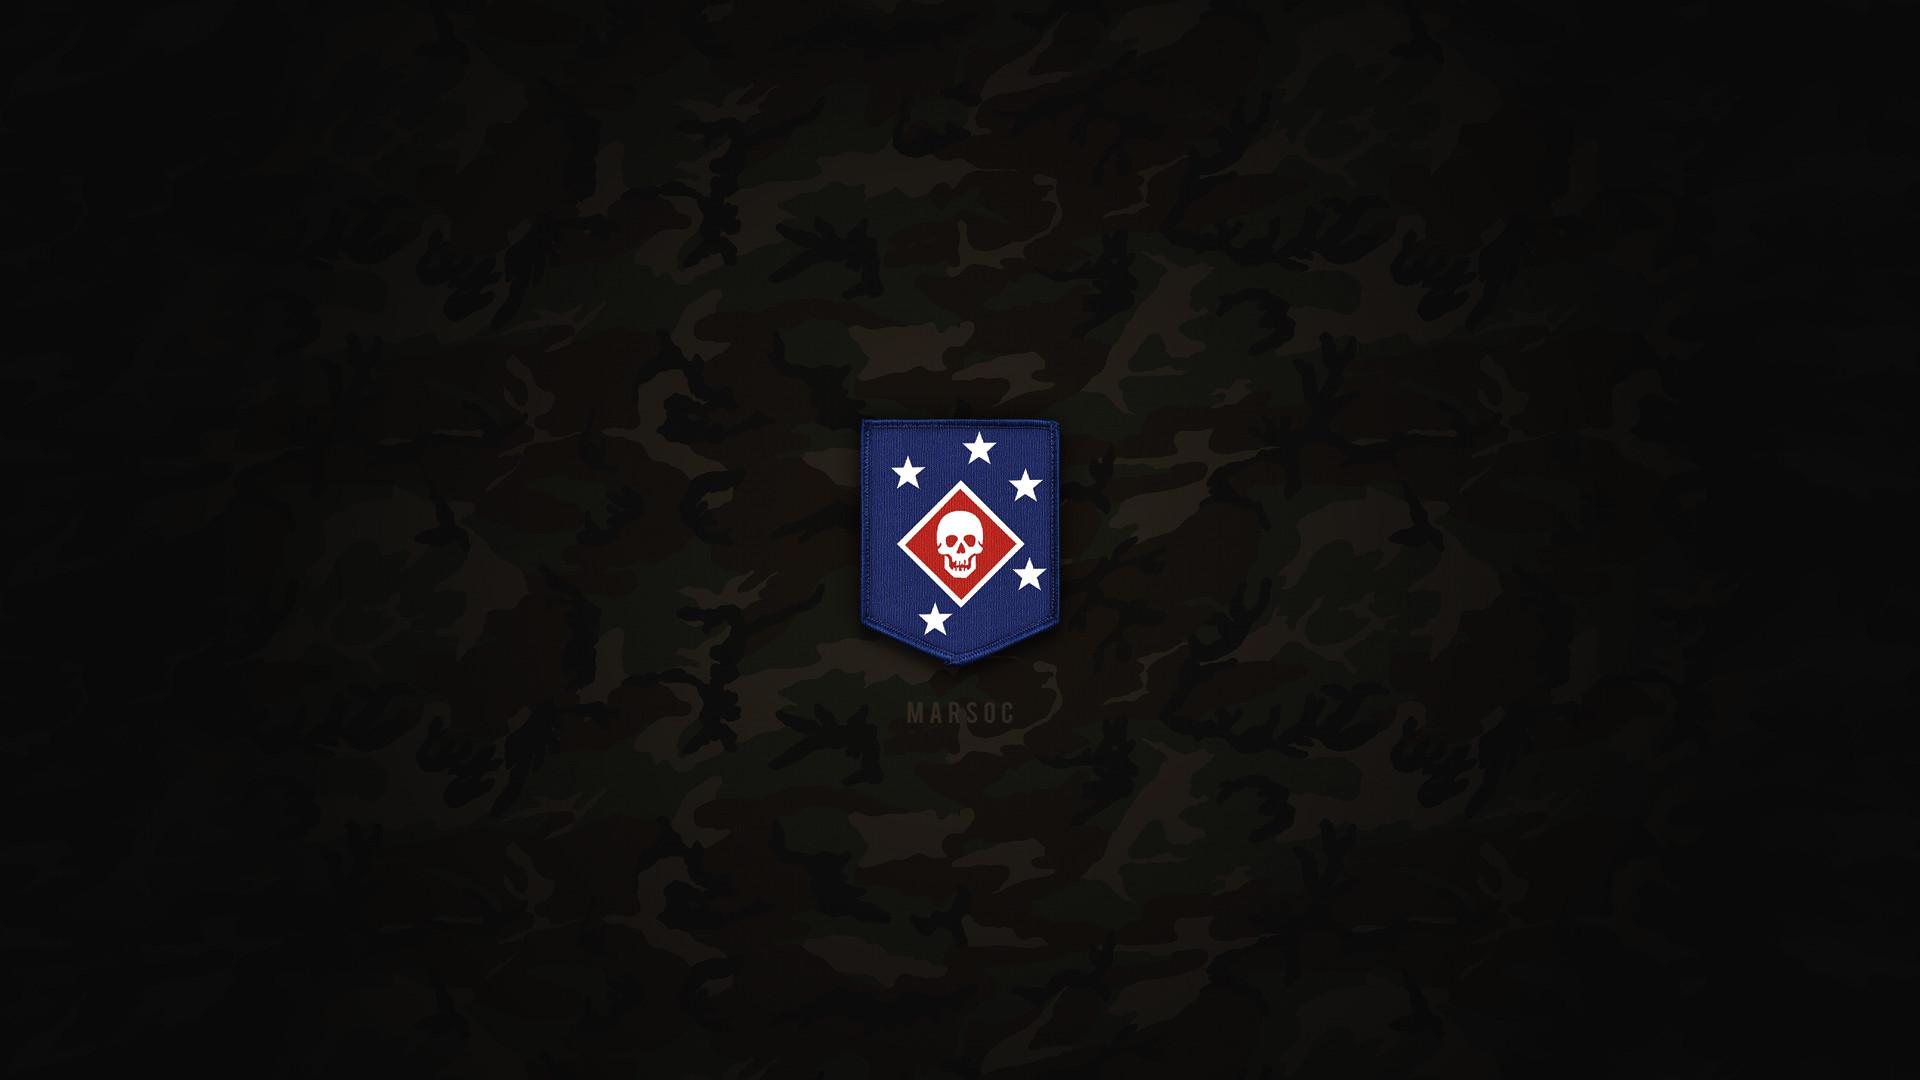 Res: 1920x1080, ... Marine Raider Patch | MARSOC | HD Wallpaper by ignitedkaos